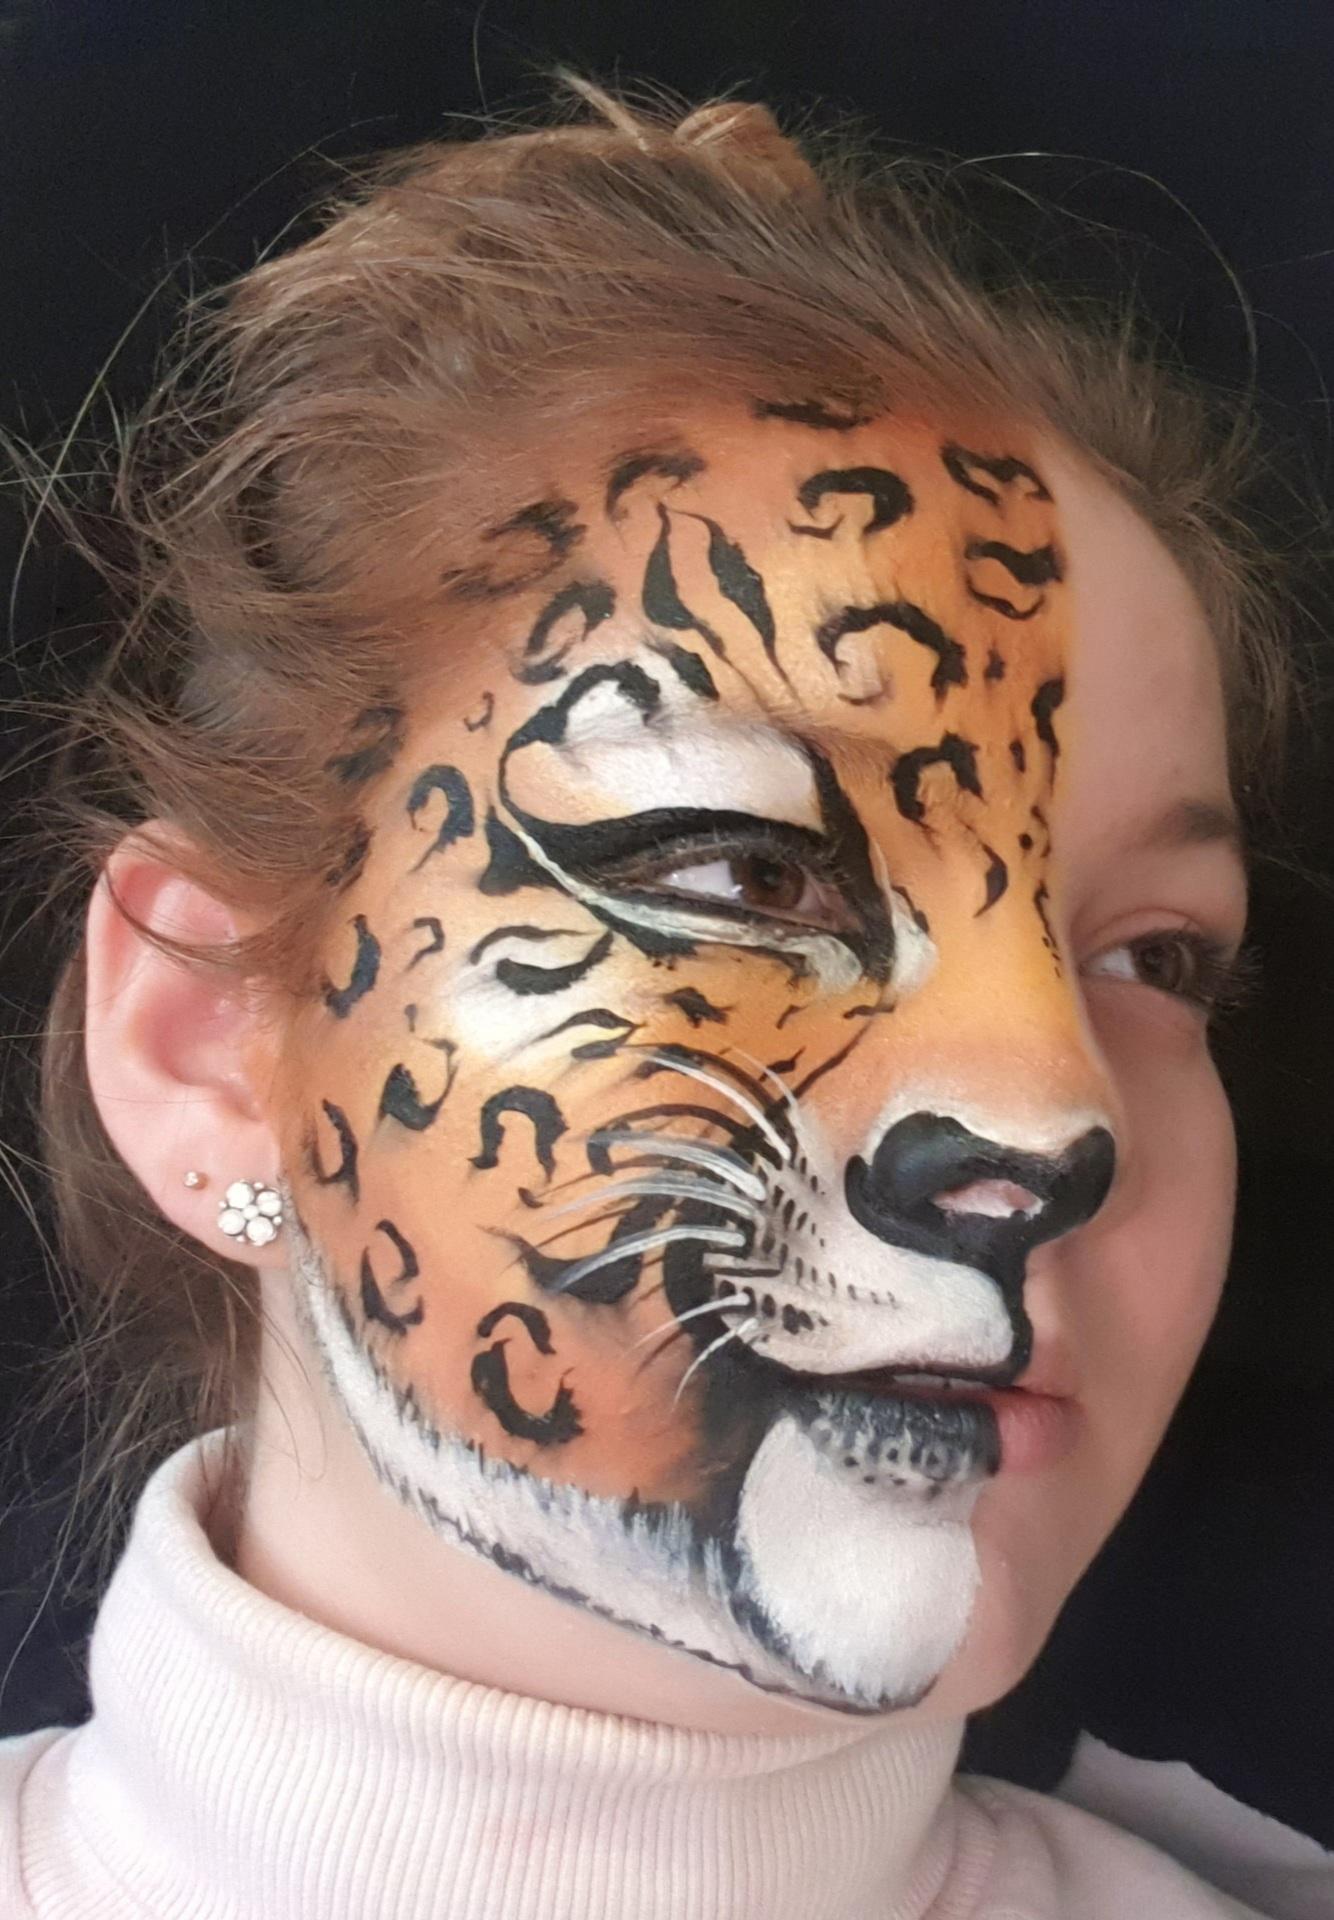 Maquillage fille professionnel léopard